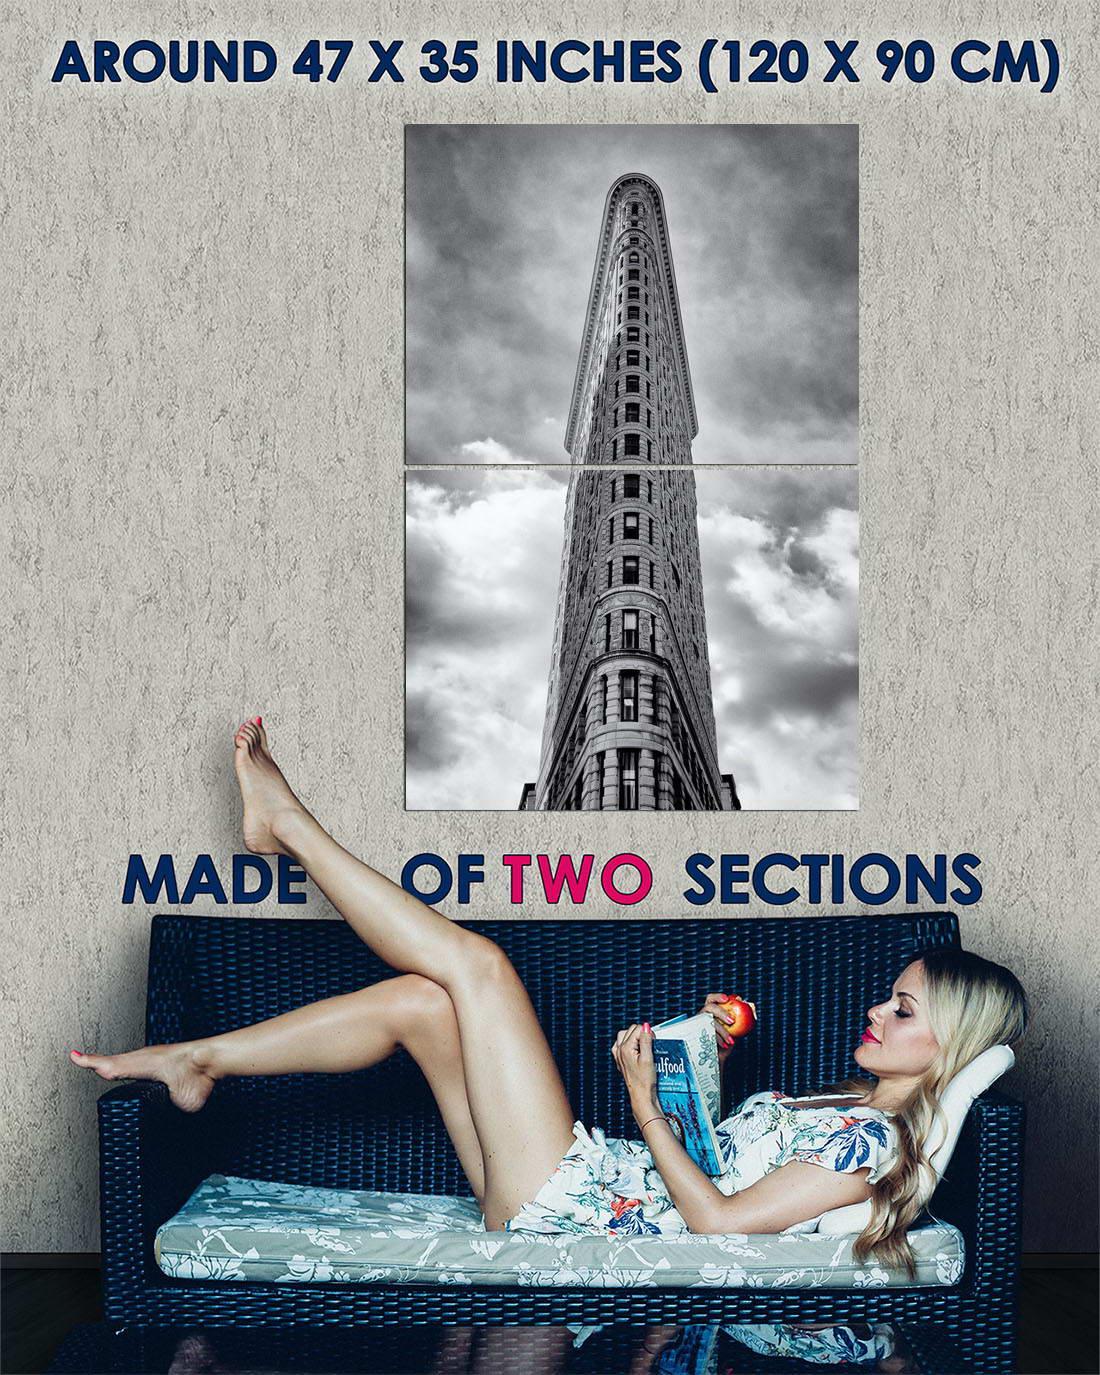 105191 flatiron building midtown manhattan new york decor. Black Bedroom Furniture Sets. Home Design Ideas